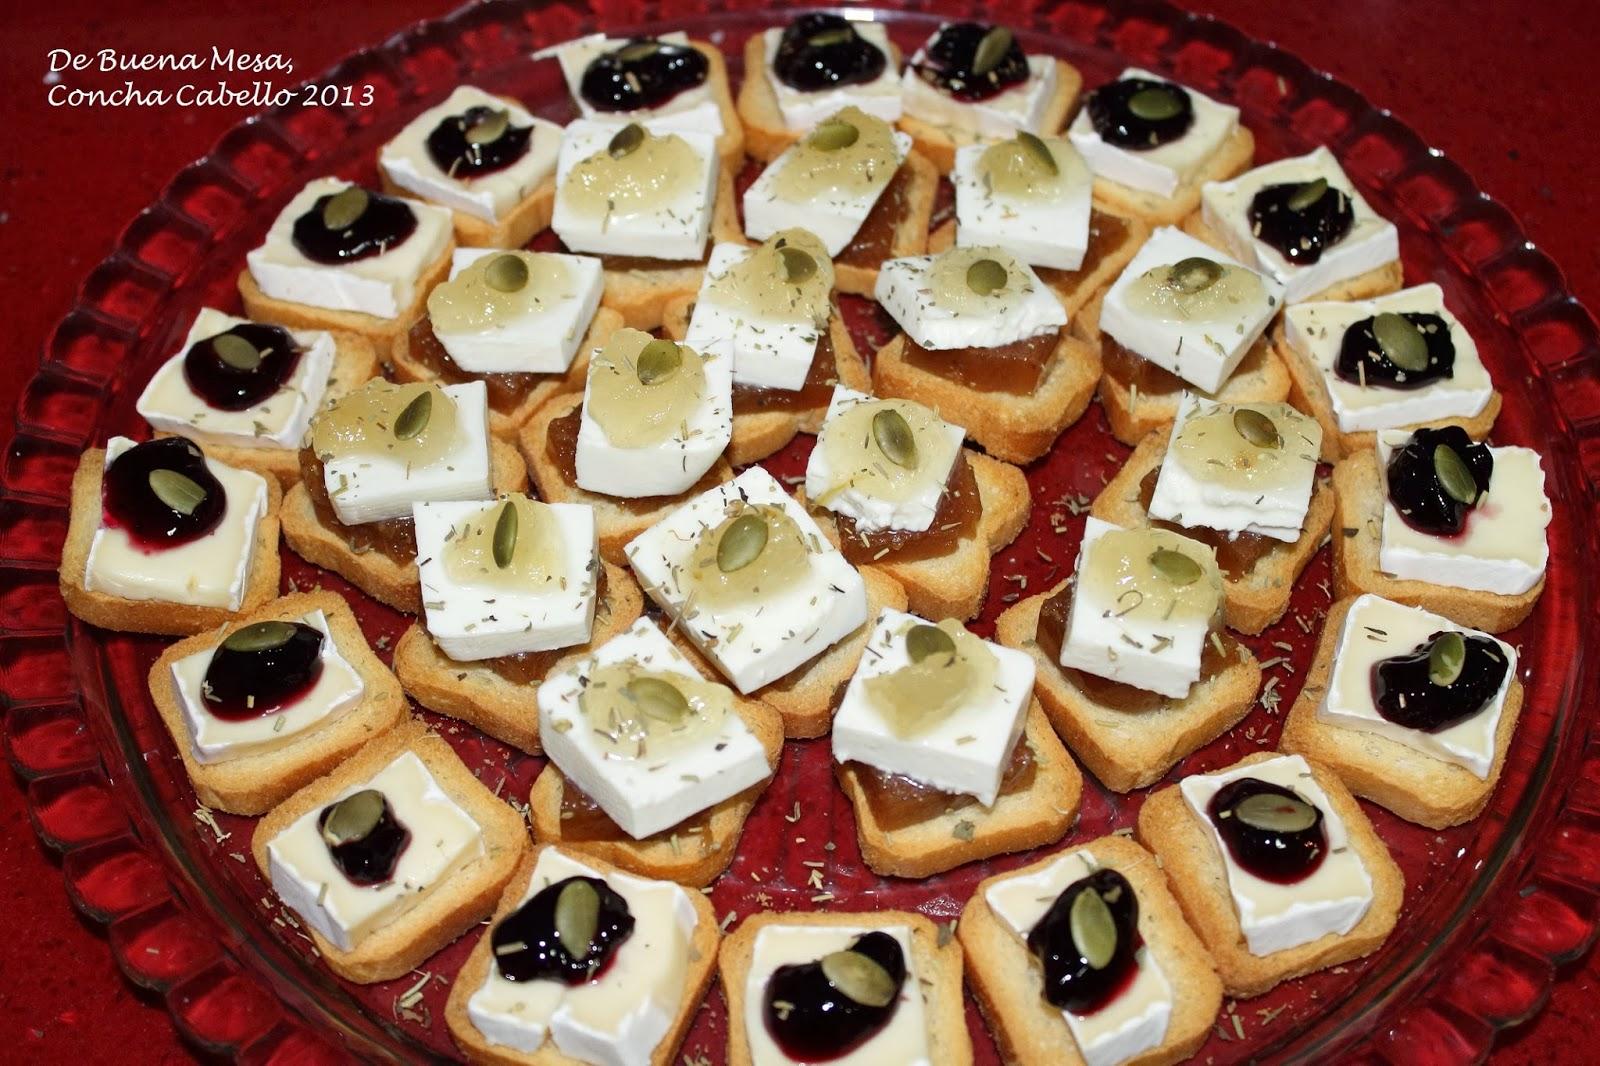 Canap s de queso fresco de cabra y queso brie for Canape queso de cabra